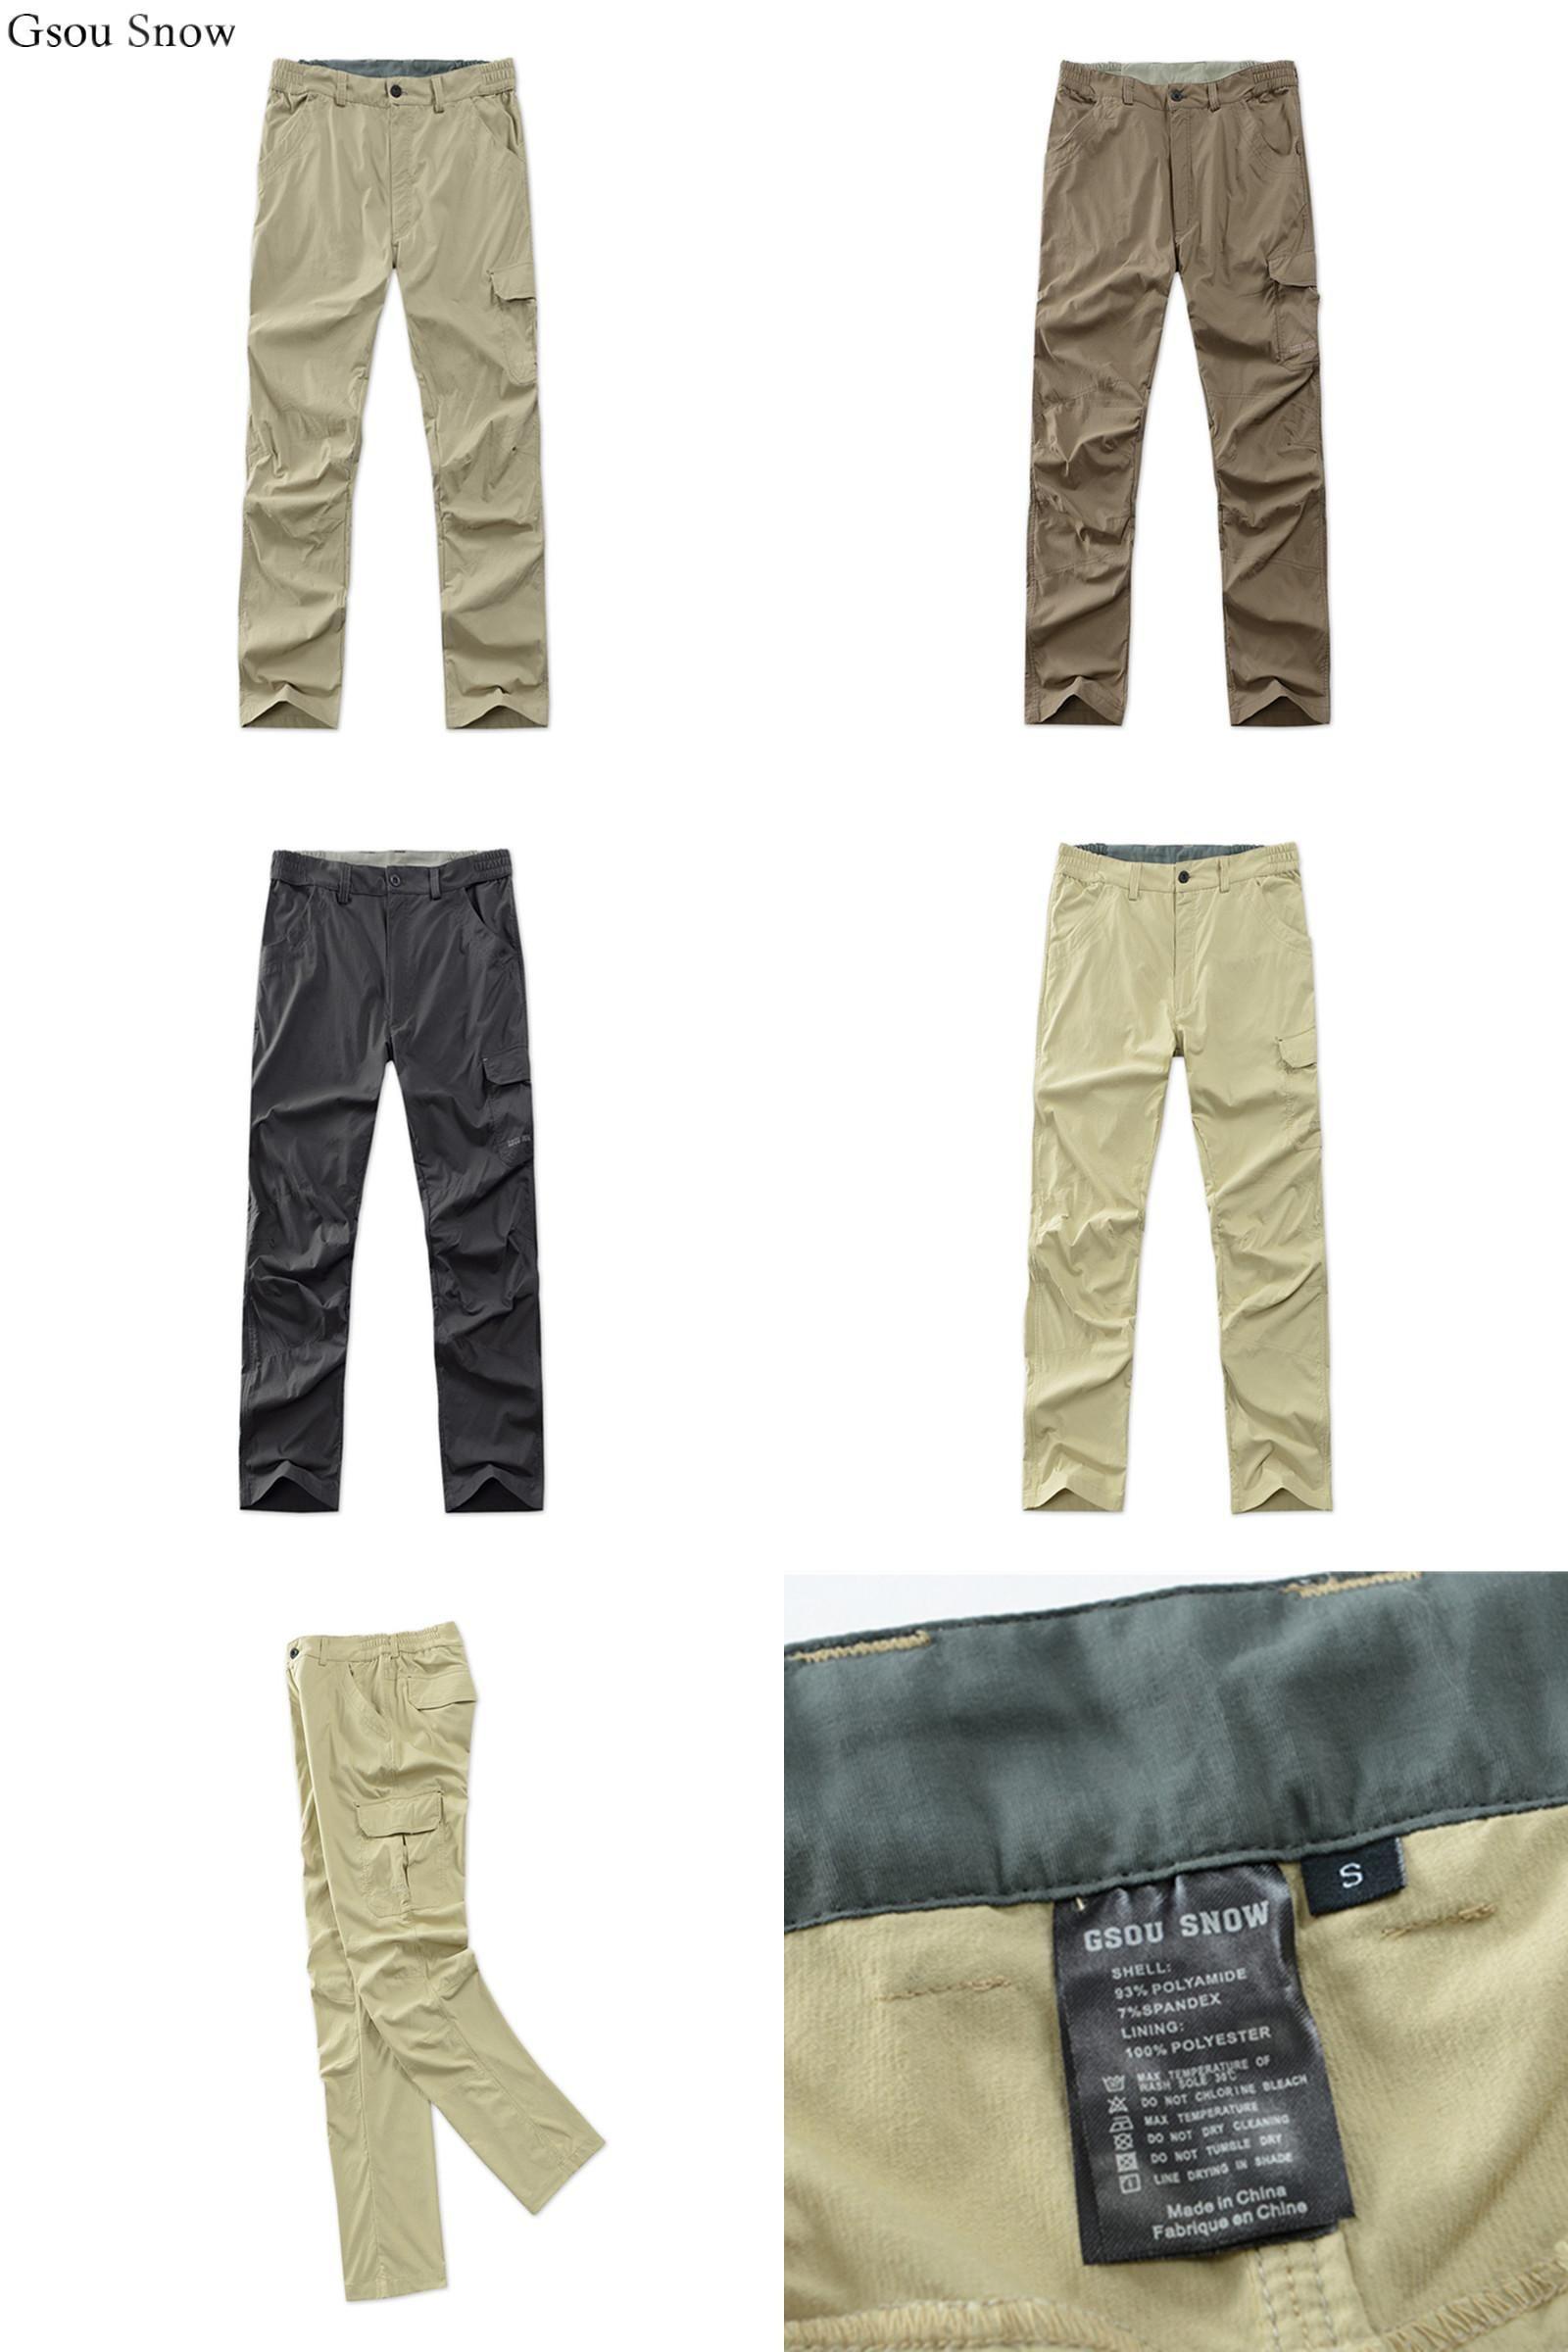 Visit To Buy Gsou Snow New Outdoor Hiking Pants Men Pantaloni Trekking Pants Trousers Fishing Camping Pantal Hiking Pants Hiking Pants Mens Best Hiking Shoes